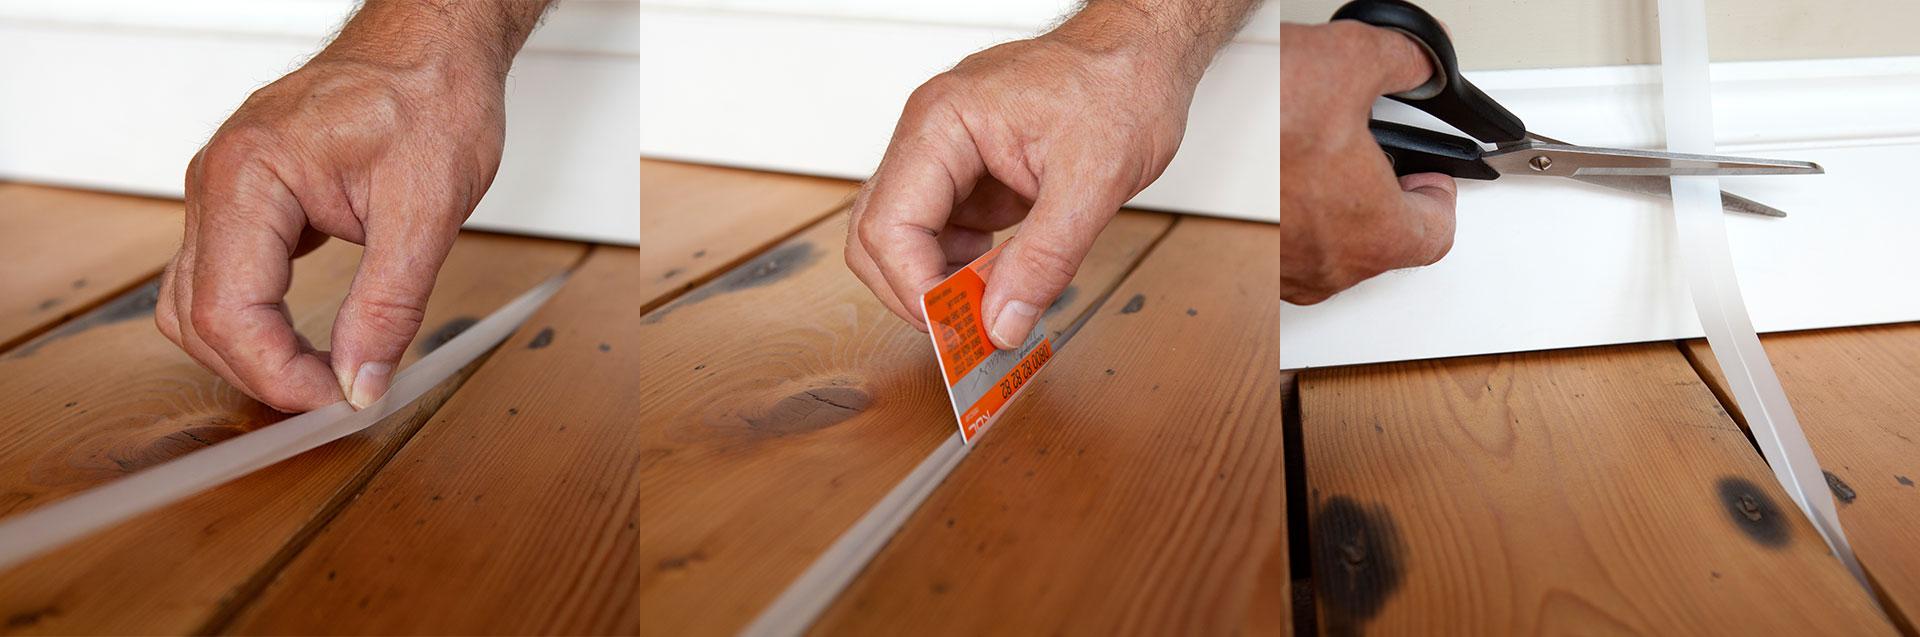 Sealing Floorboard Gaps Stopgap